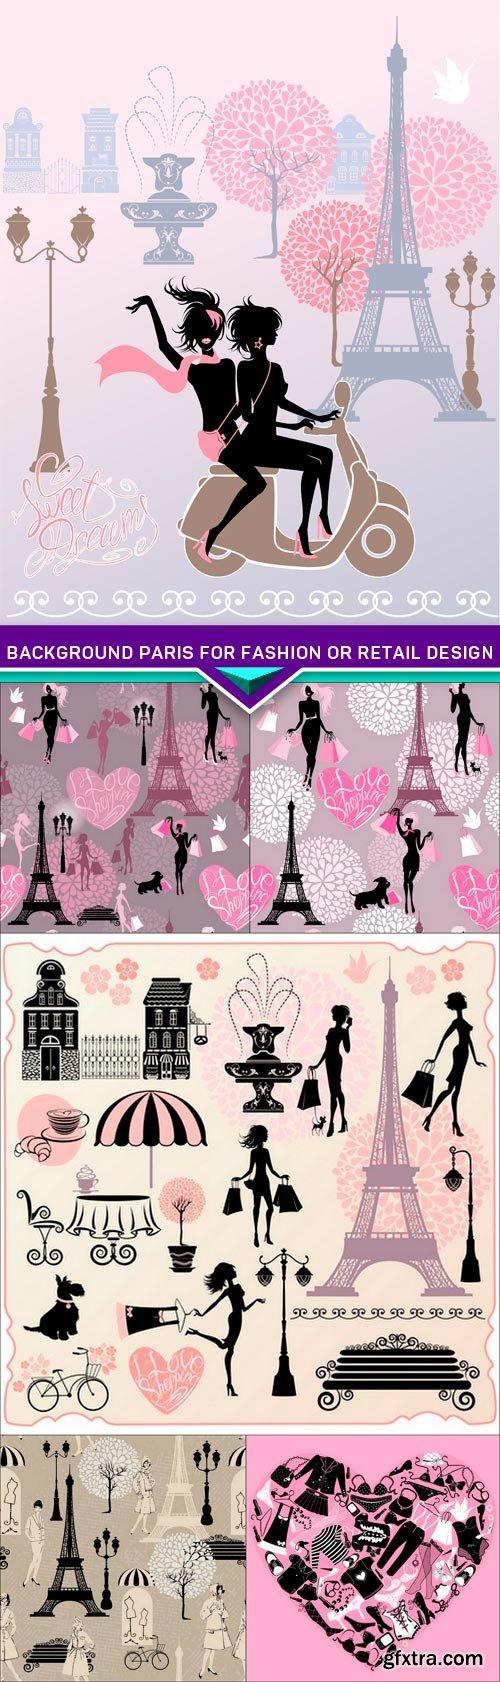 Background Paris for fashion or retail design 6X EPS